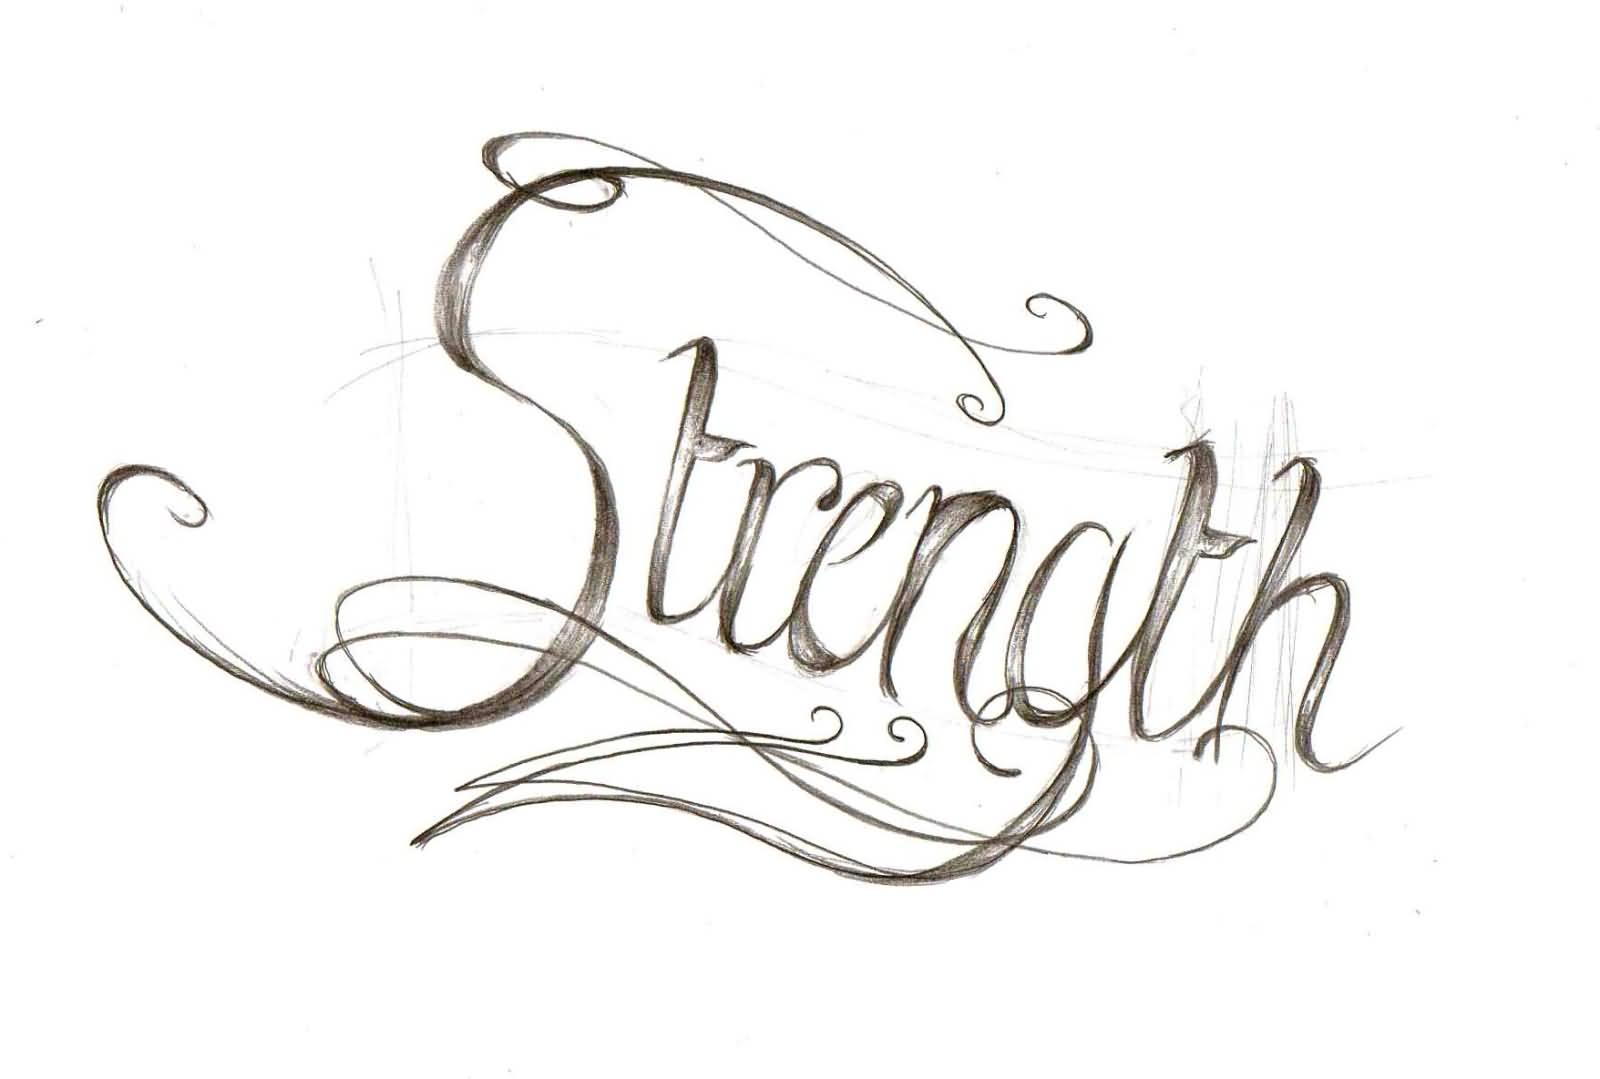 35 strength tattoos ideas nice strength word tattoo sketch biocorpaavc